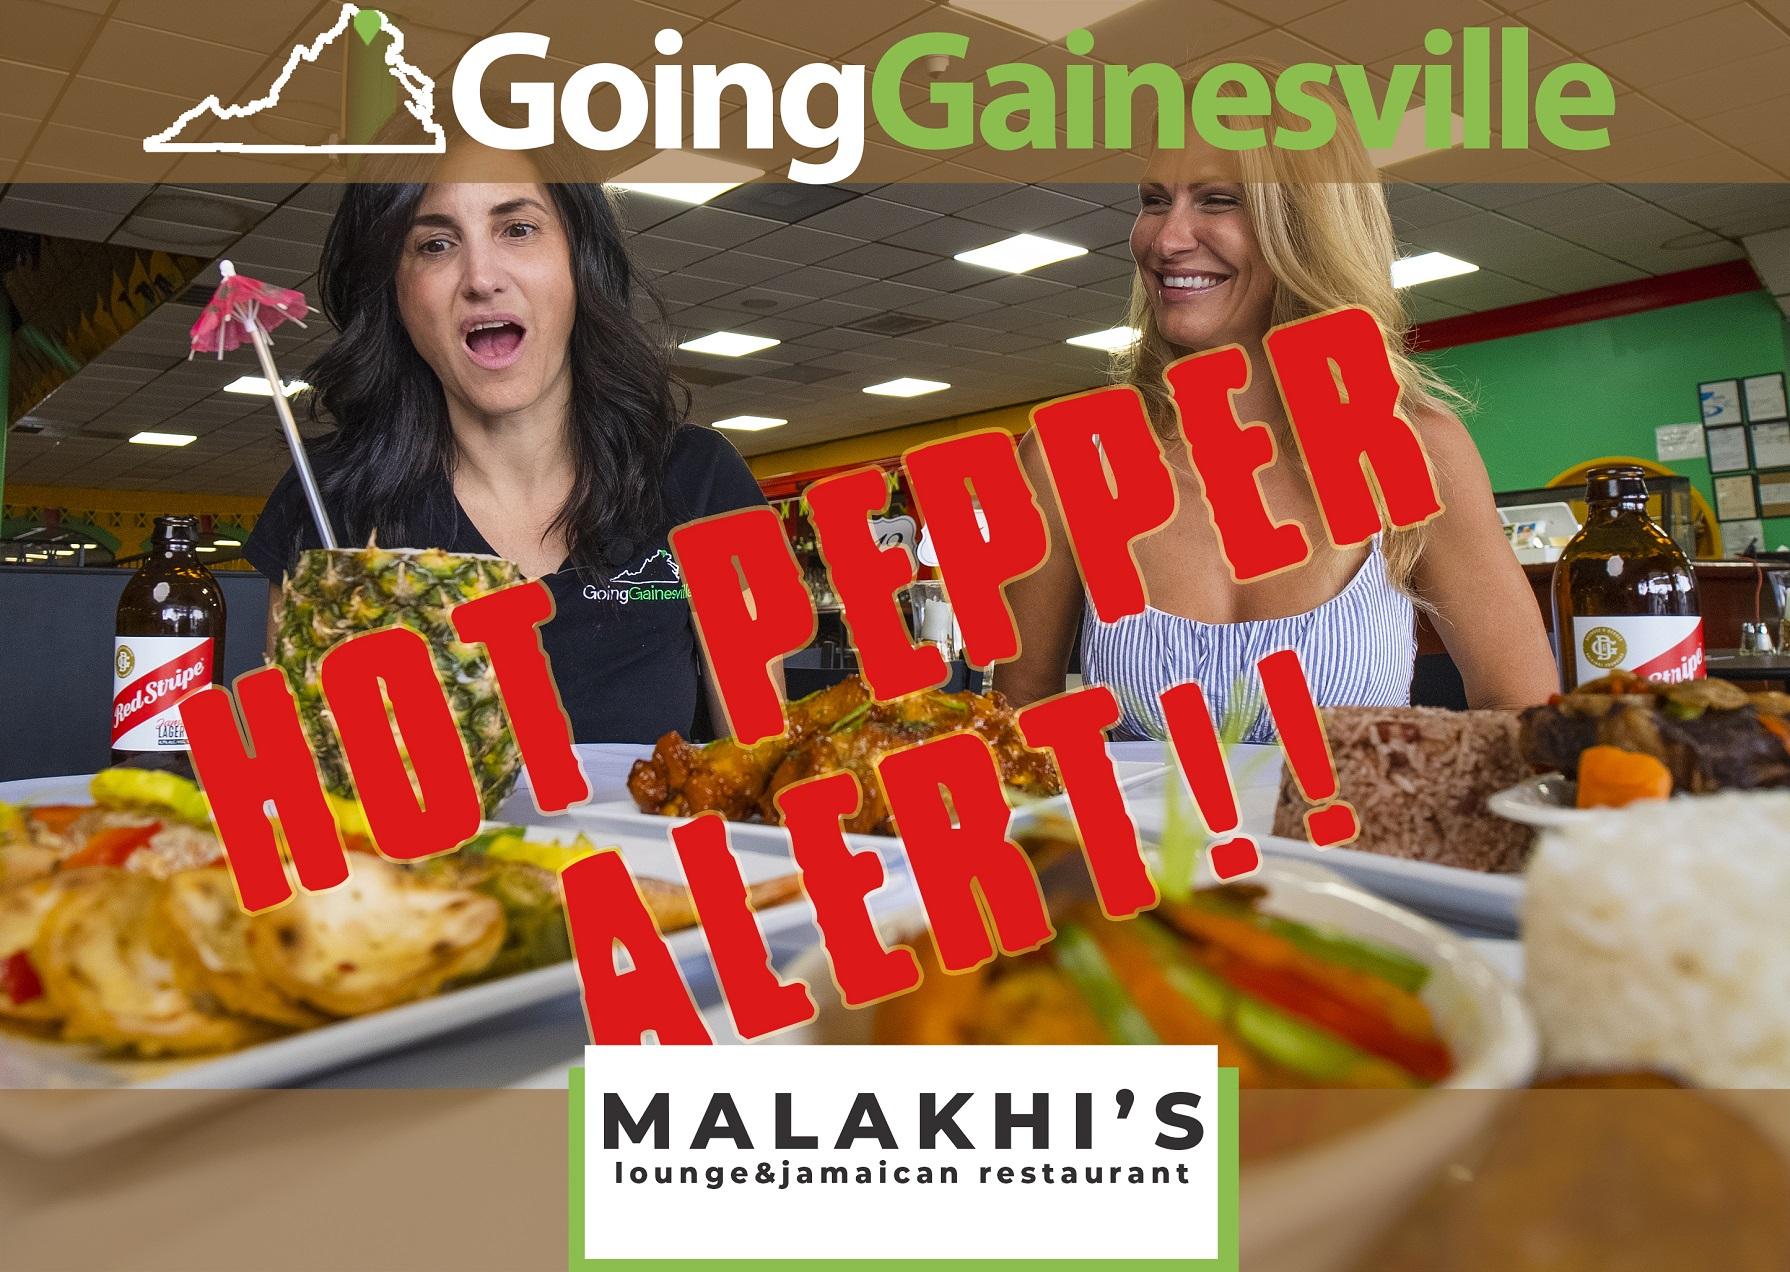 Malakhi Lounge & Jamaican Restaurant